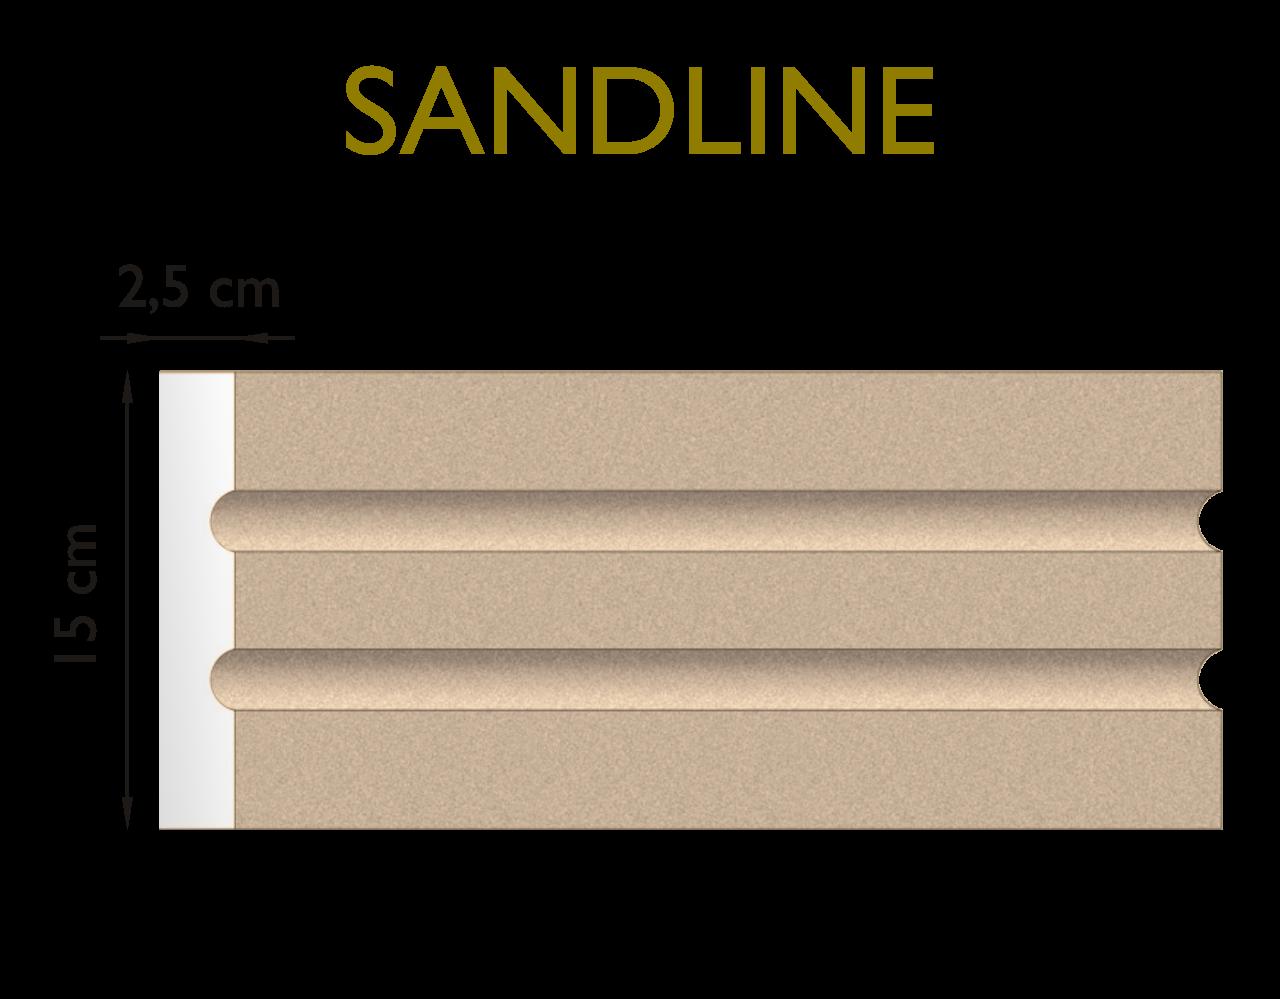 SAN-R-137